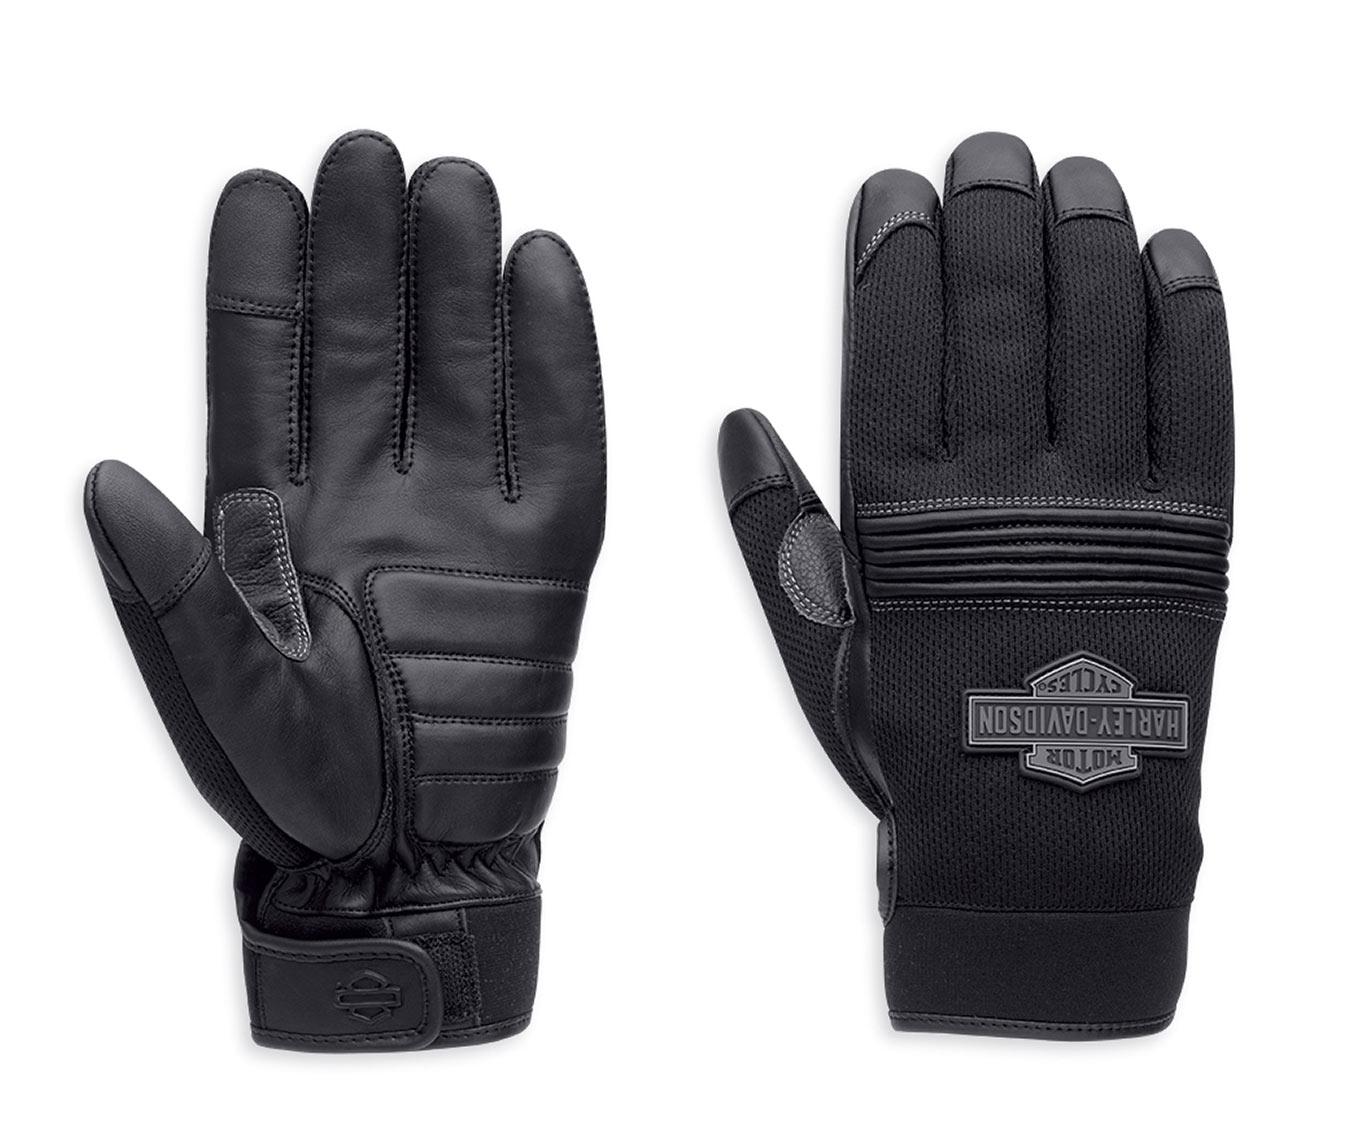 98387 16vm harley davidson handschuhe stark im thunderbike. Black Bedroom Furniture Sets. Home Design Ideas